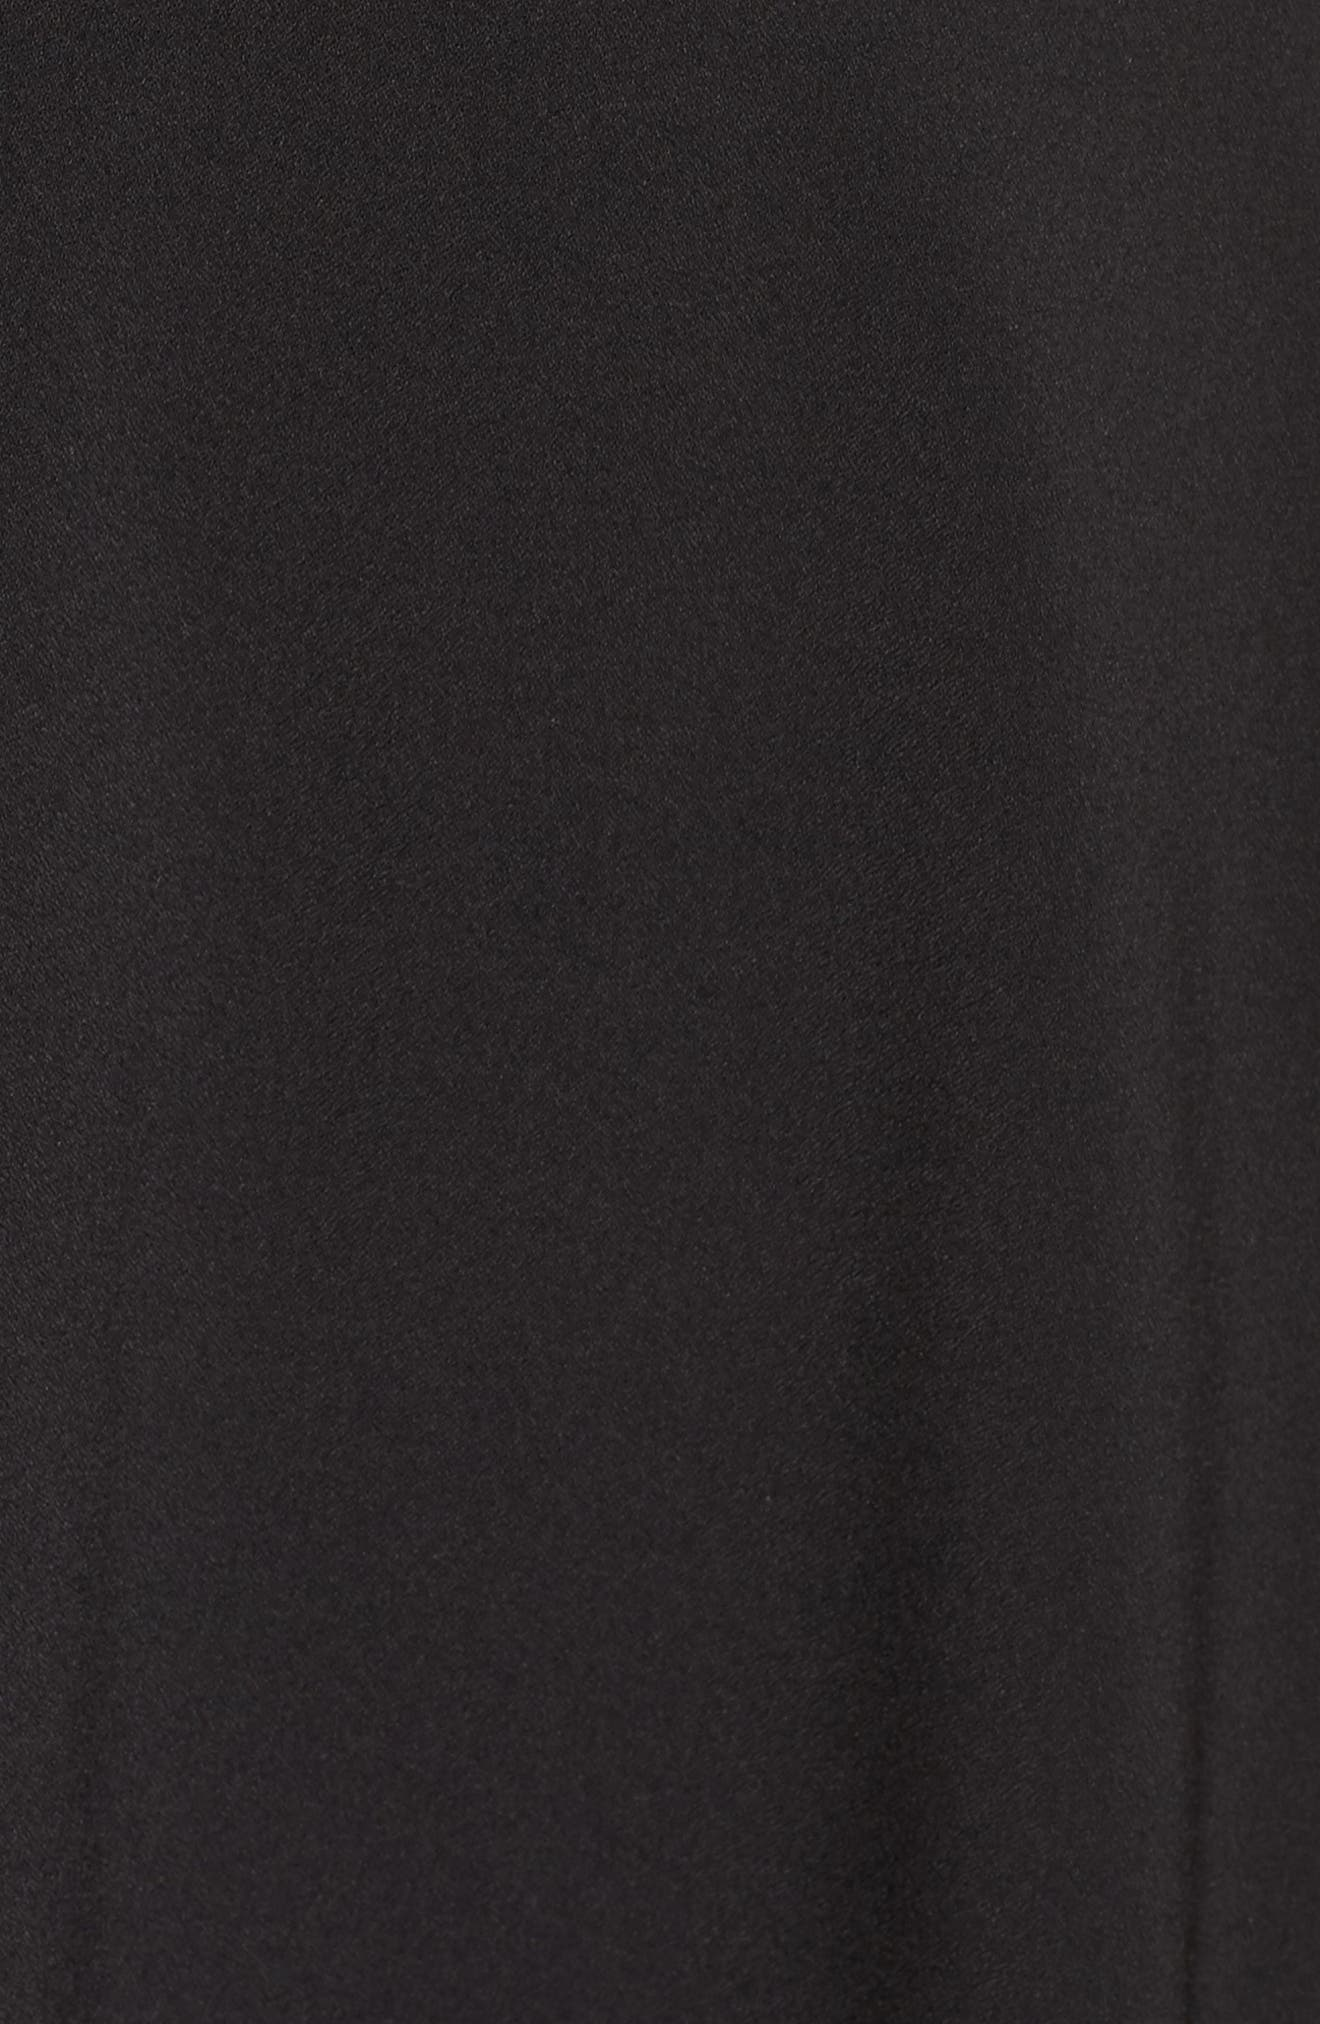 Tie Front Crepe Fit & Flare Dress,                             Alternate thumbnail 5, color,                             Black